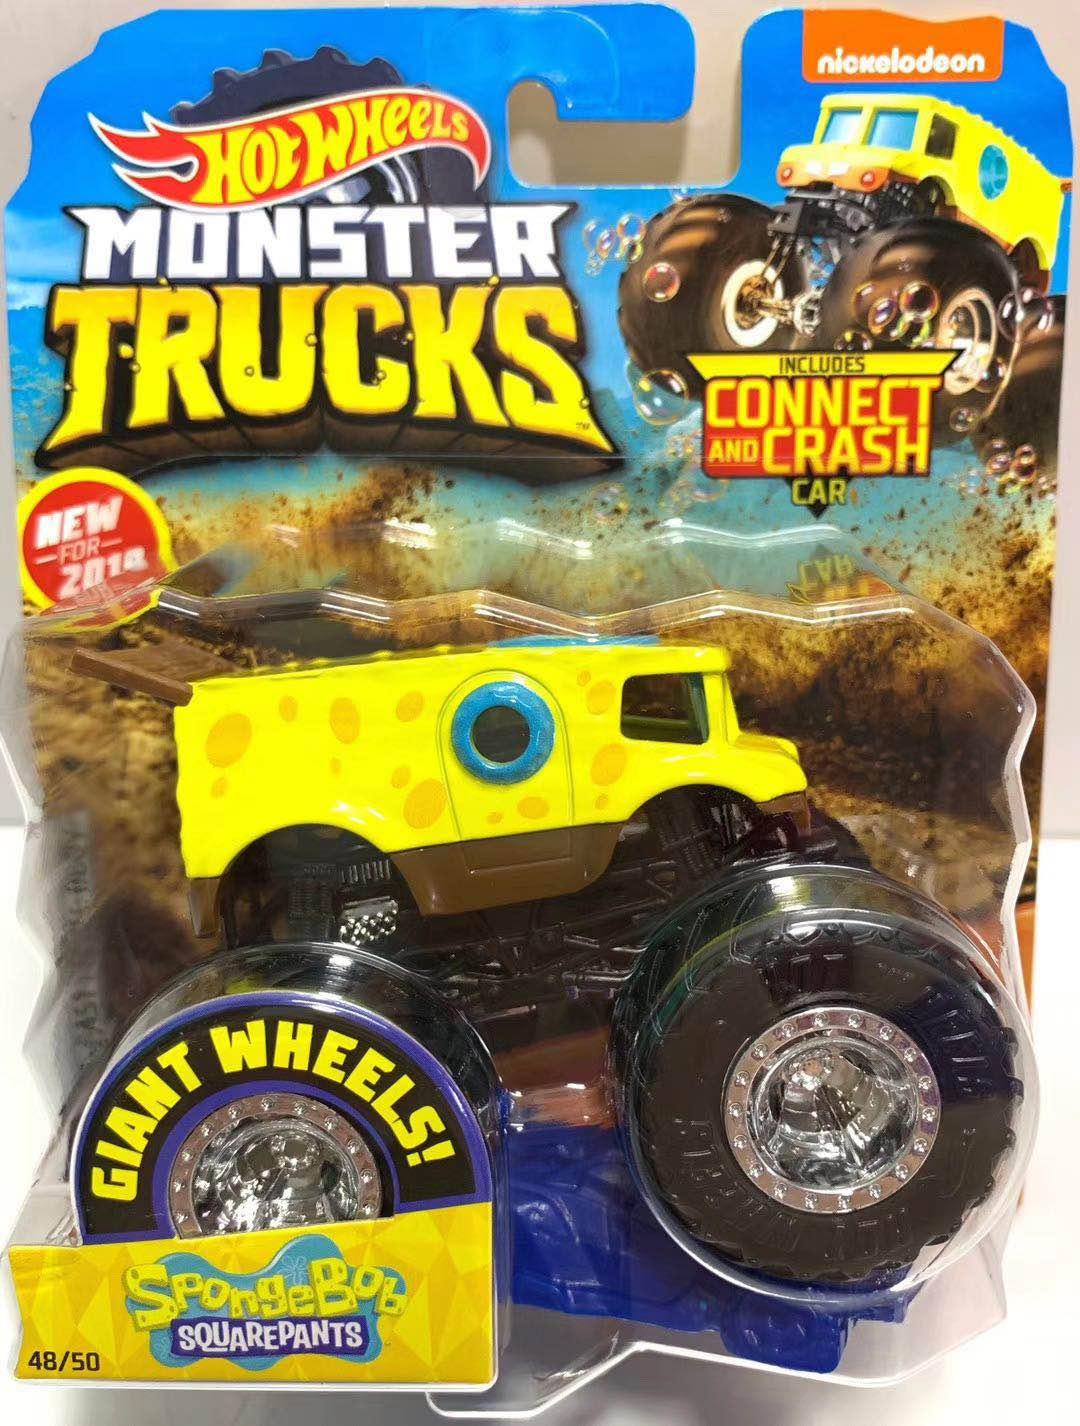 Car-Toy Wheels Metal-Model Monster Barbarism Giant Crazy Children Birthday-Gift Big 1:64